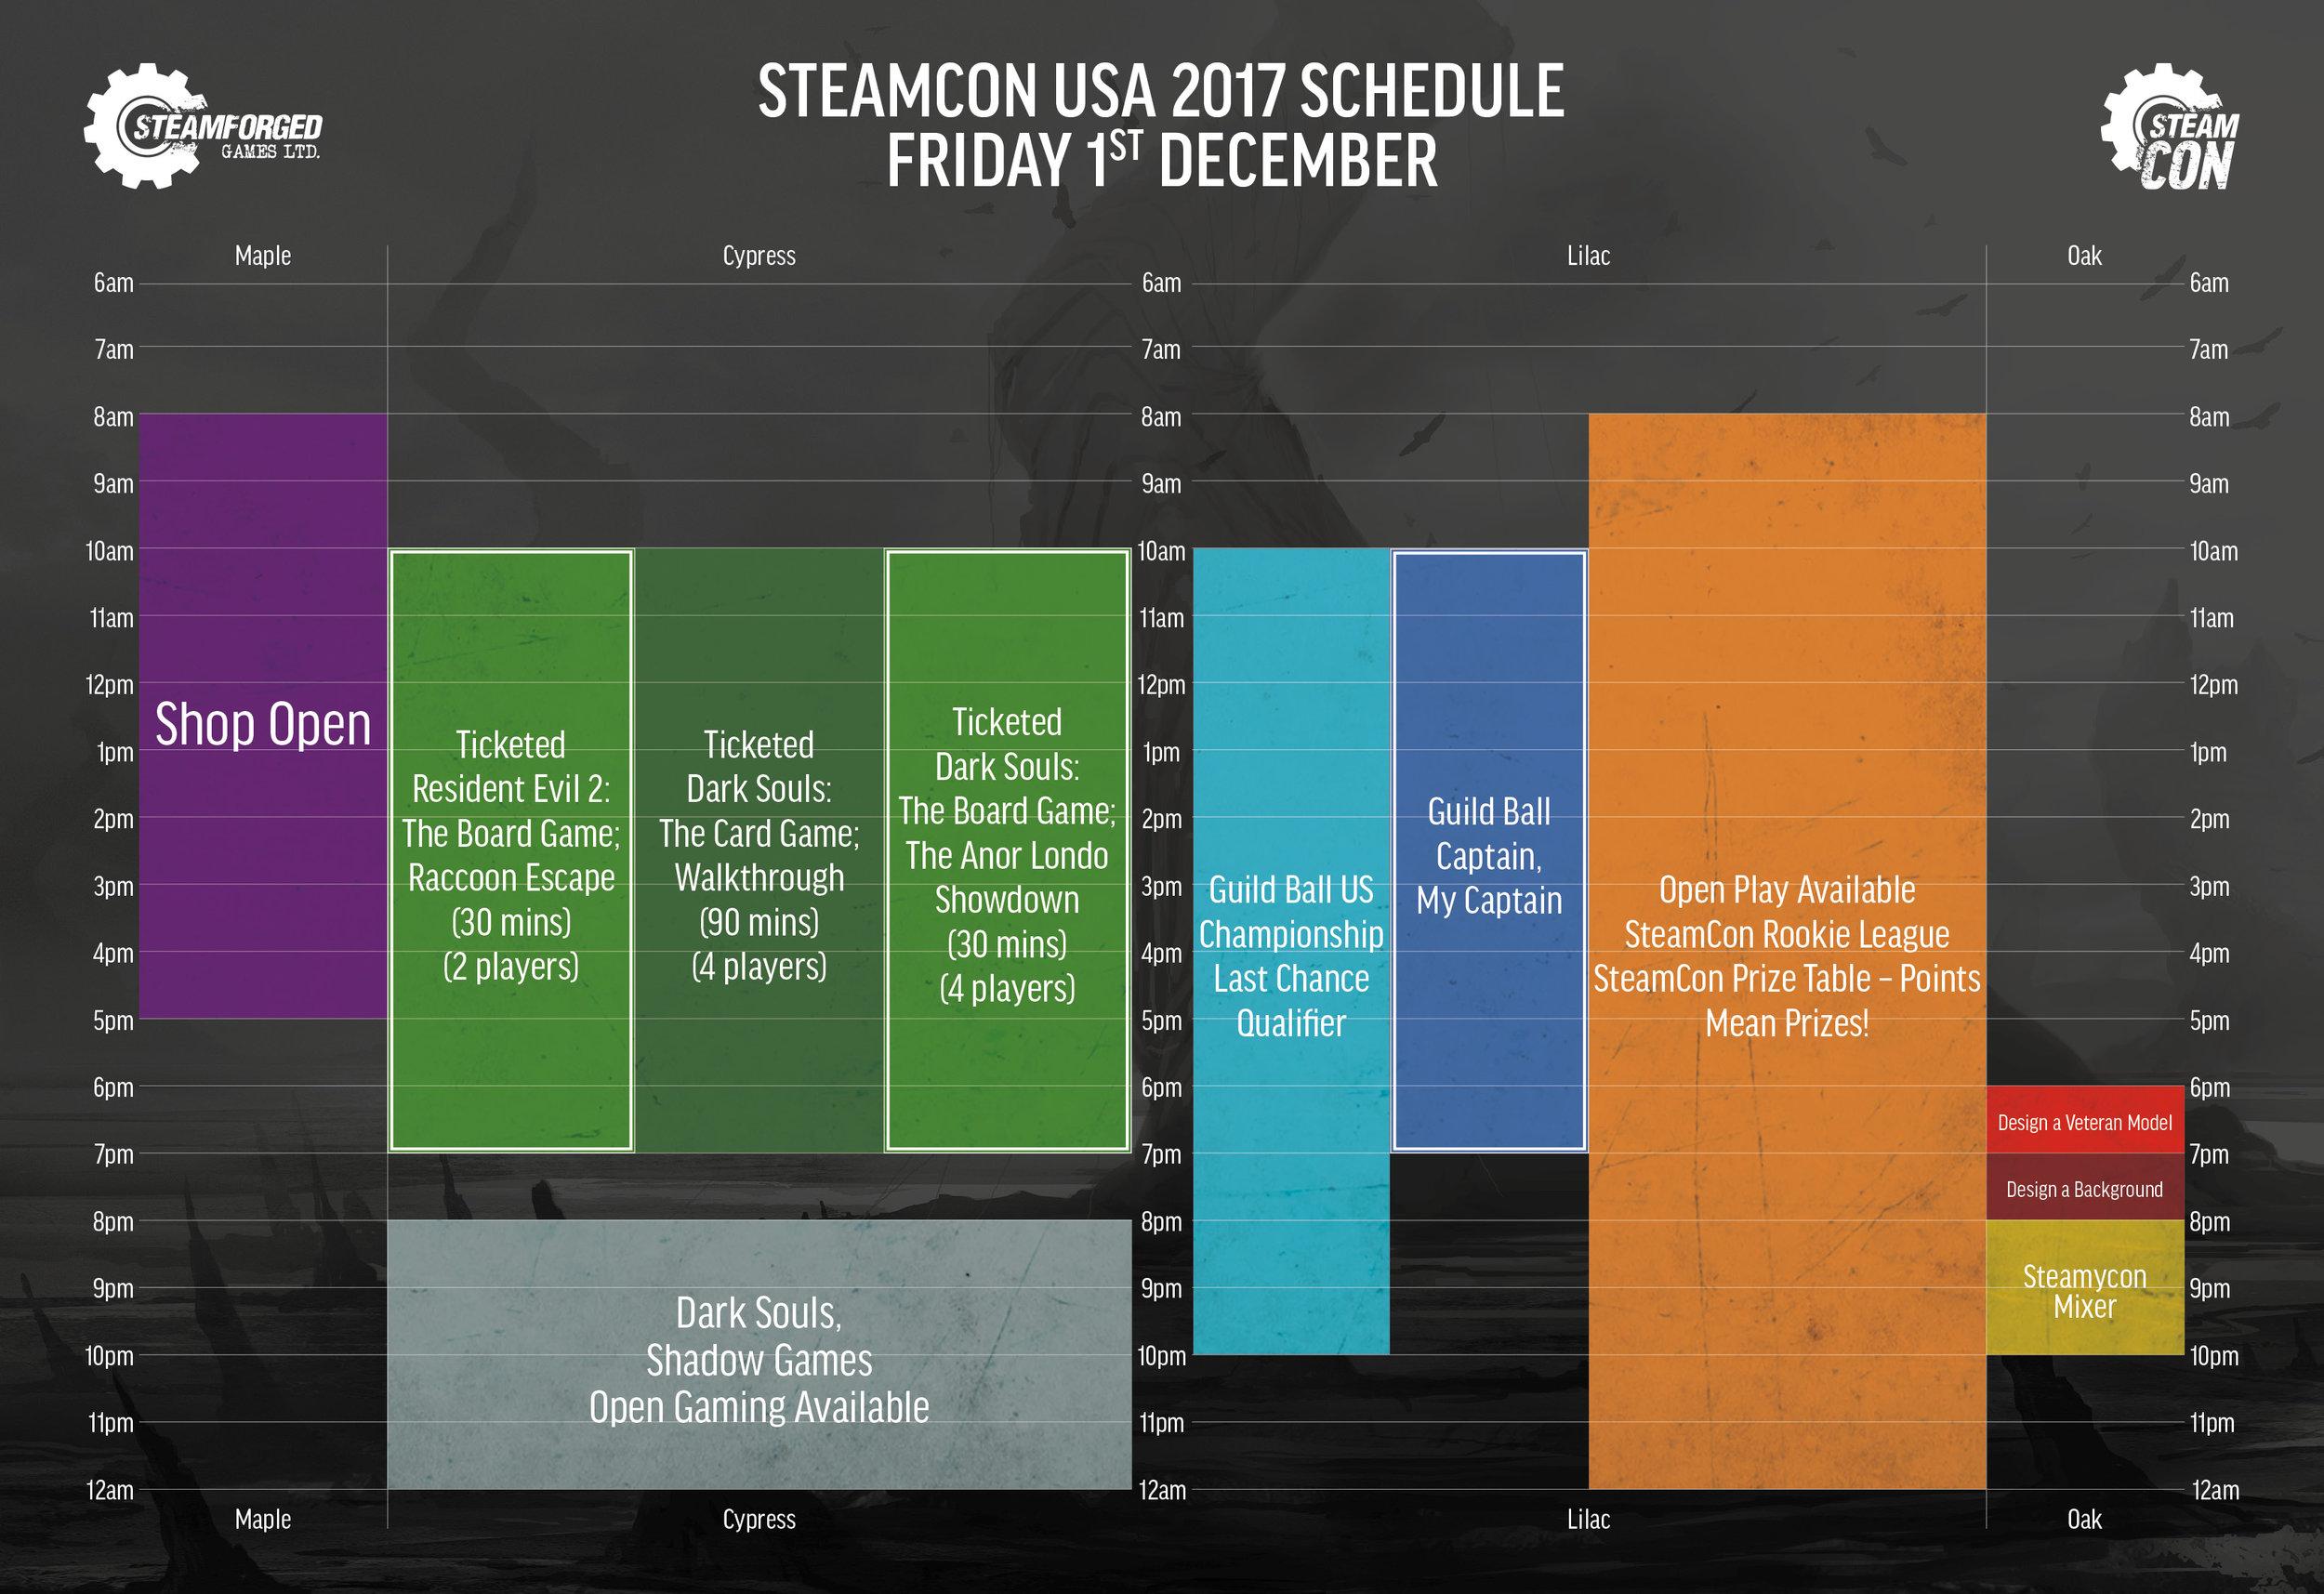 SC2017-Schedule-Web-USA-Friday.jpg